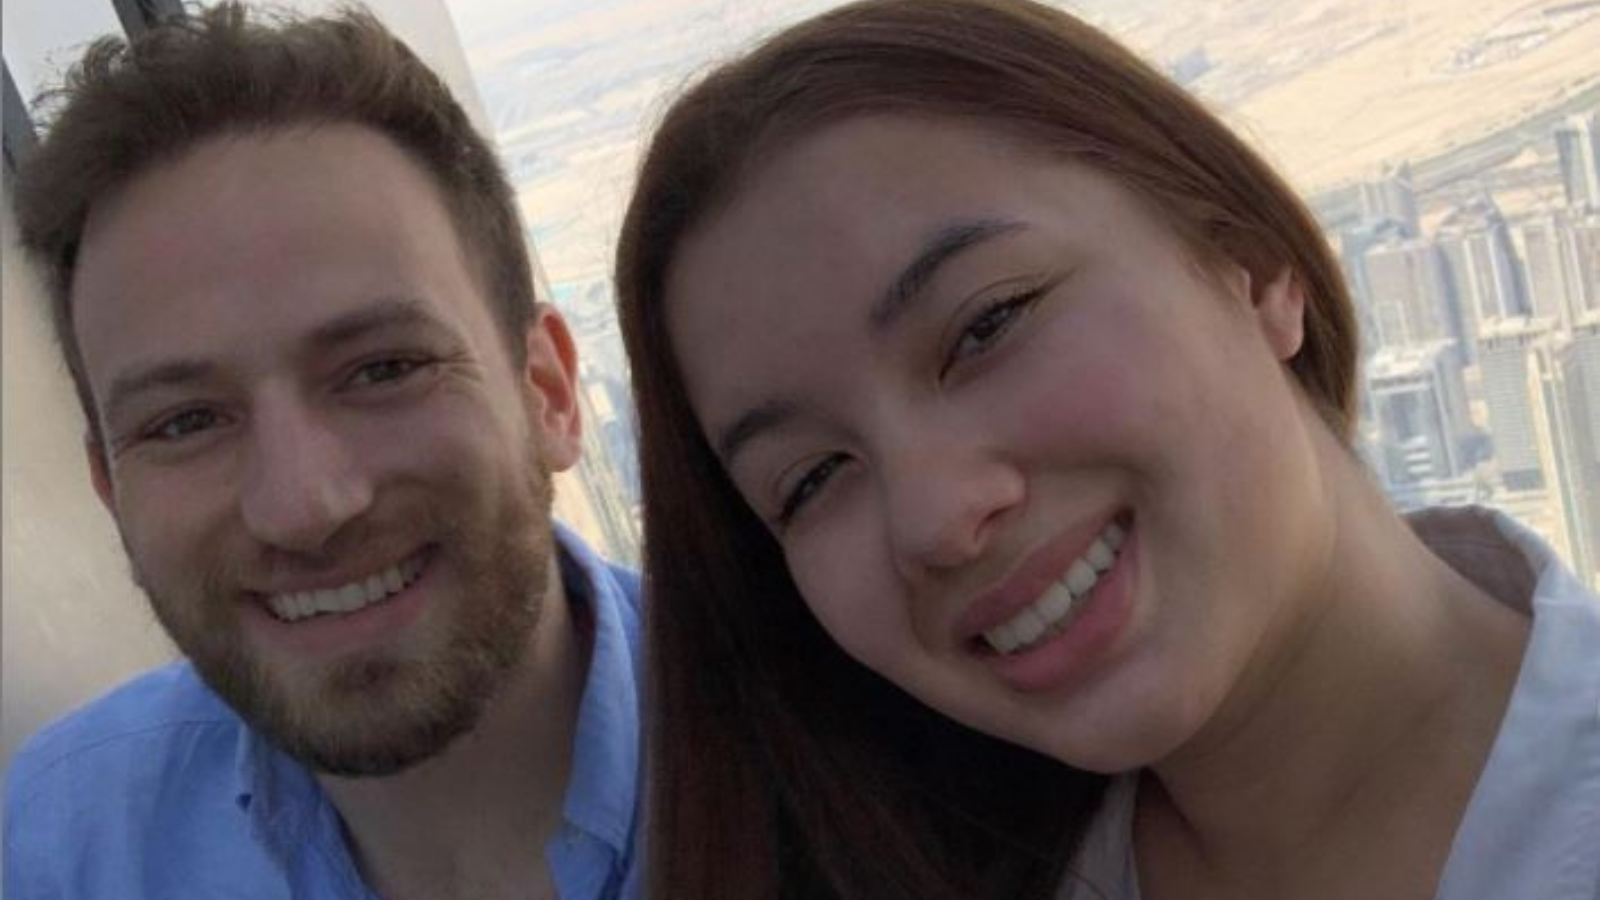 Greek man held over death of British wife following burglary claim